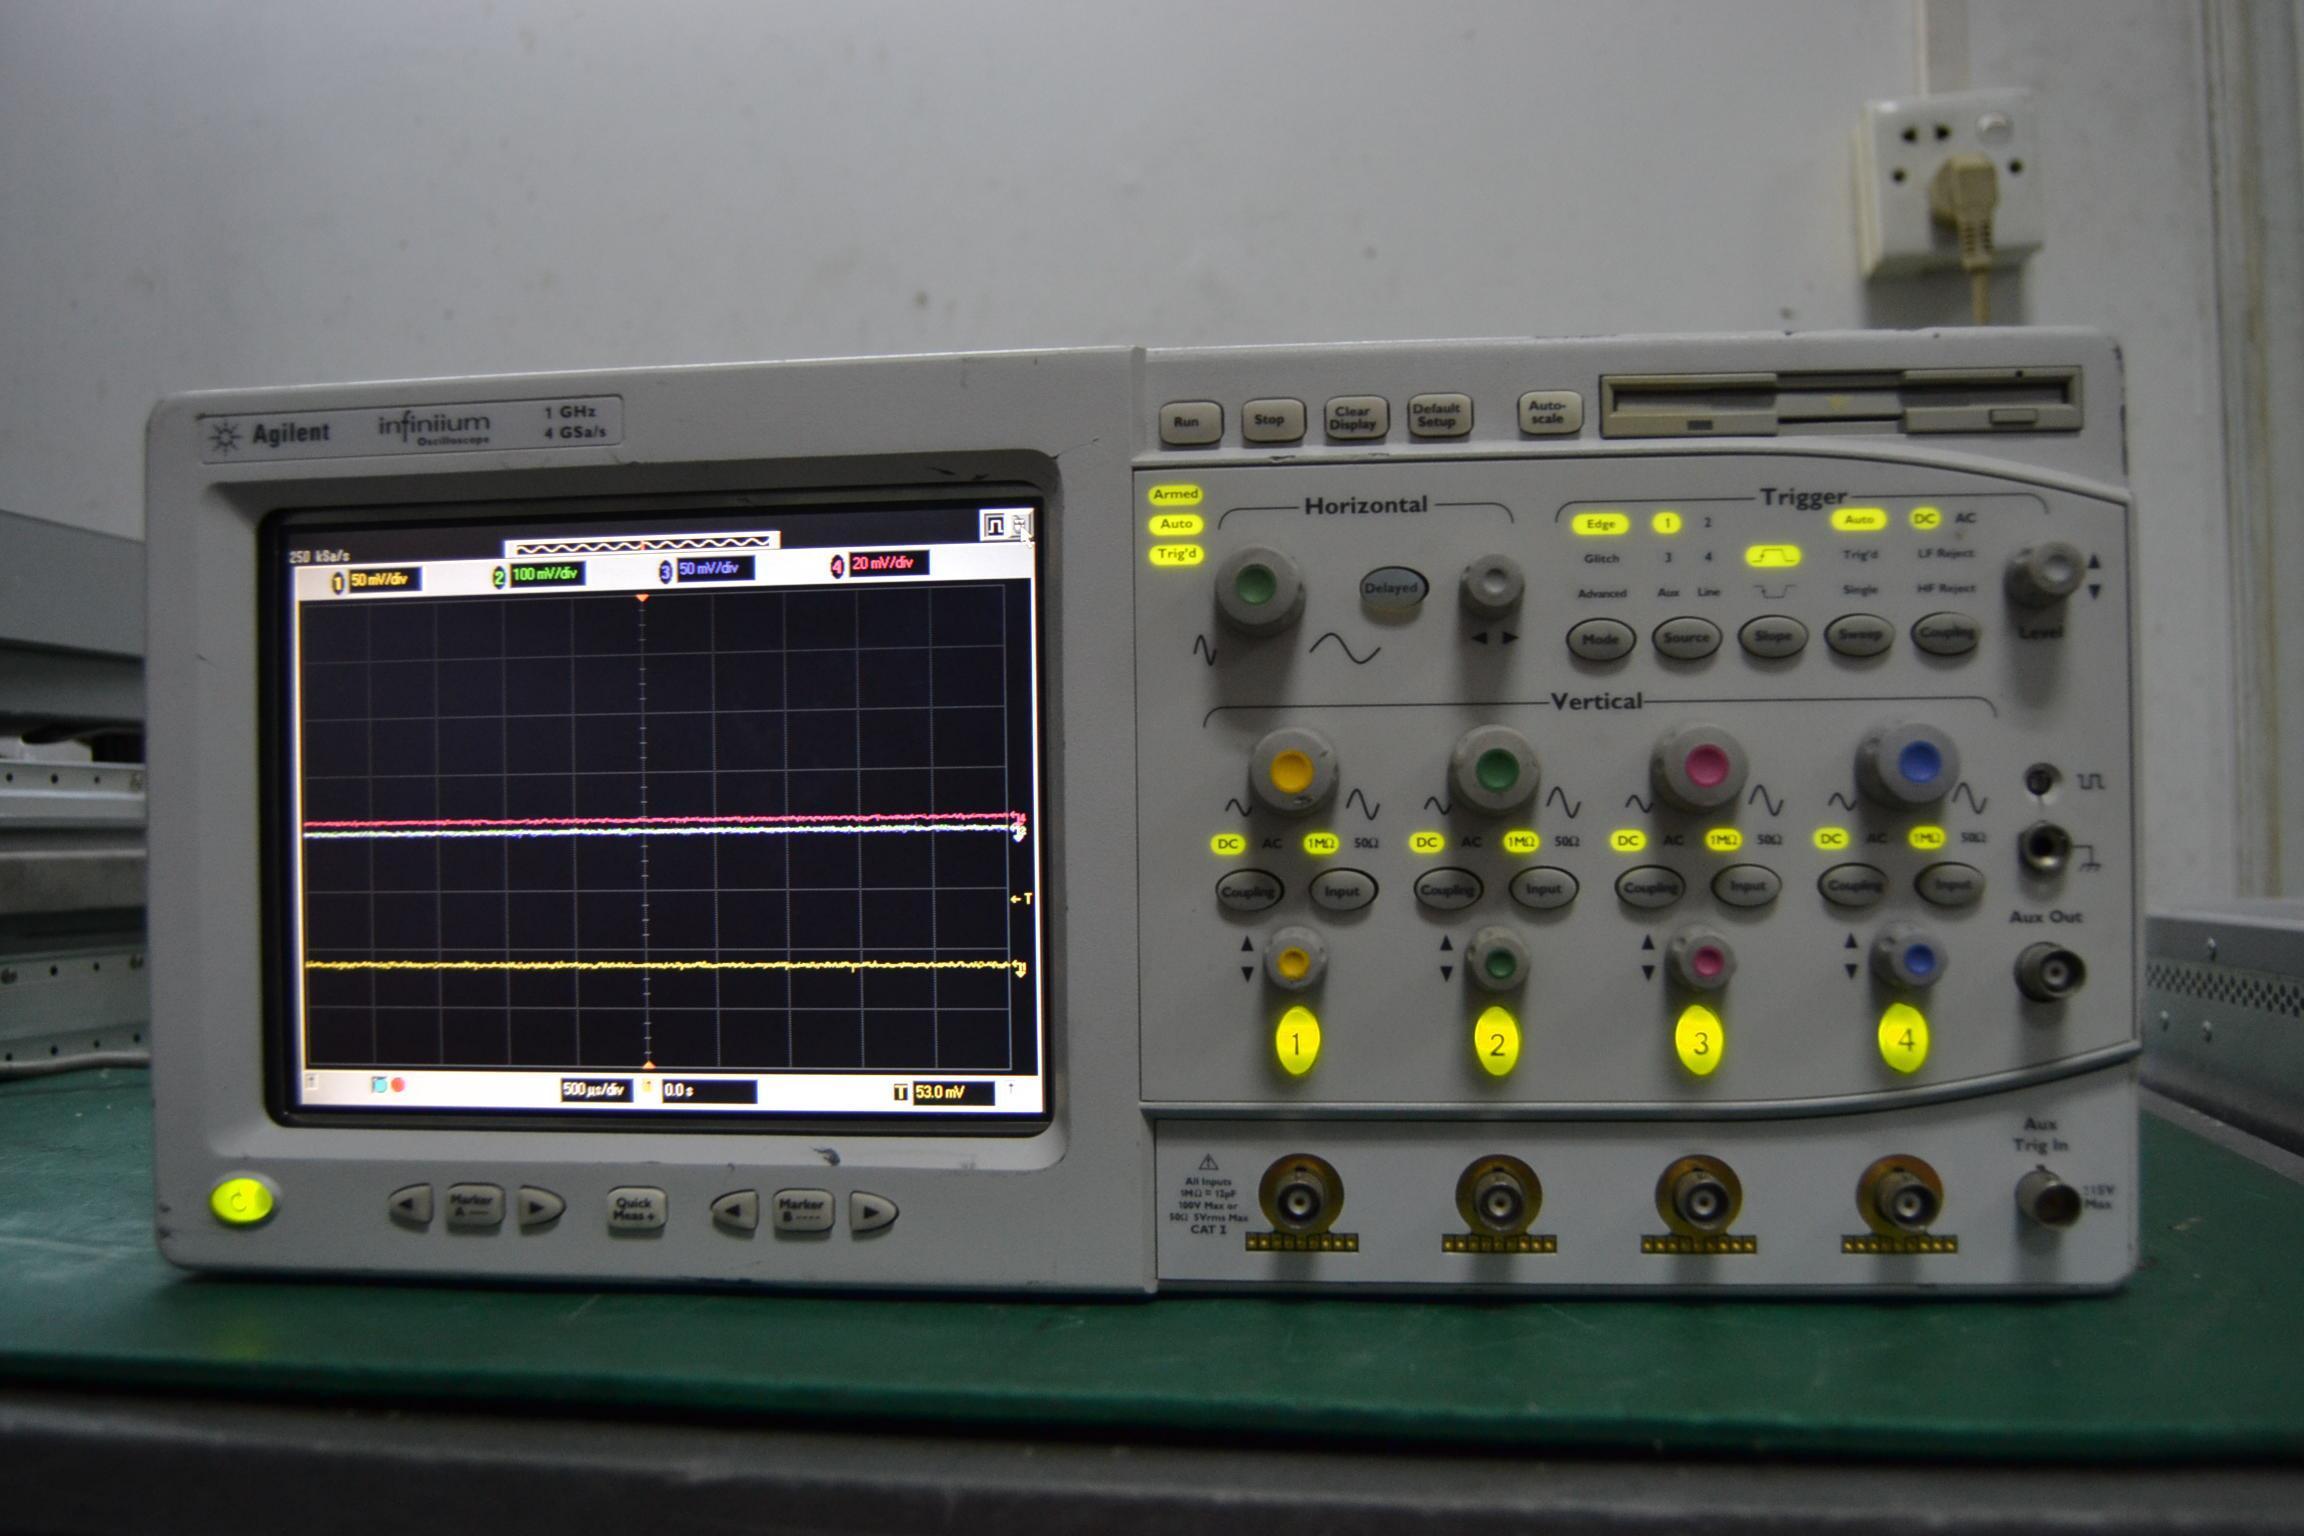 54833A Infiniium示波器:双通道、1GHz带宽、高达4 GSa/s采样率   Agilent Infiniium 54833A是目前市场上价格最便宜的1 GHz示波器。 54833A是新一代深内存示波器,目前提供前所未有的128 Mpts存储器。 借助先进的MegaZoom技术,您即使在深内存状态时也能得到即时响应,利用最好的分辨率揭示快速事件,高达16 Mpts的的存储器选件,价格依然诱人。1 GHz的带宽和高达4 GSa/s的采样率确保快速,精确的捕获波形。 特性 1 GHz带宽 高达4